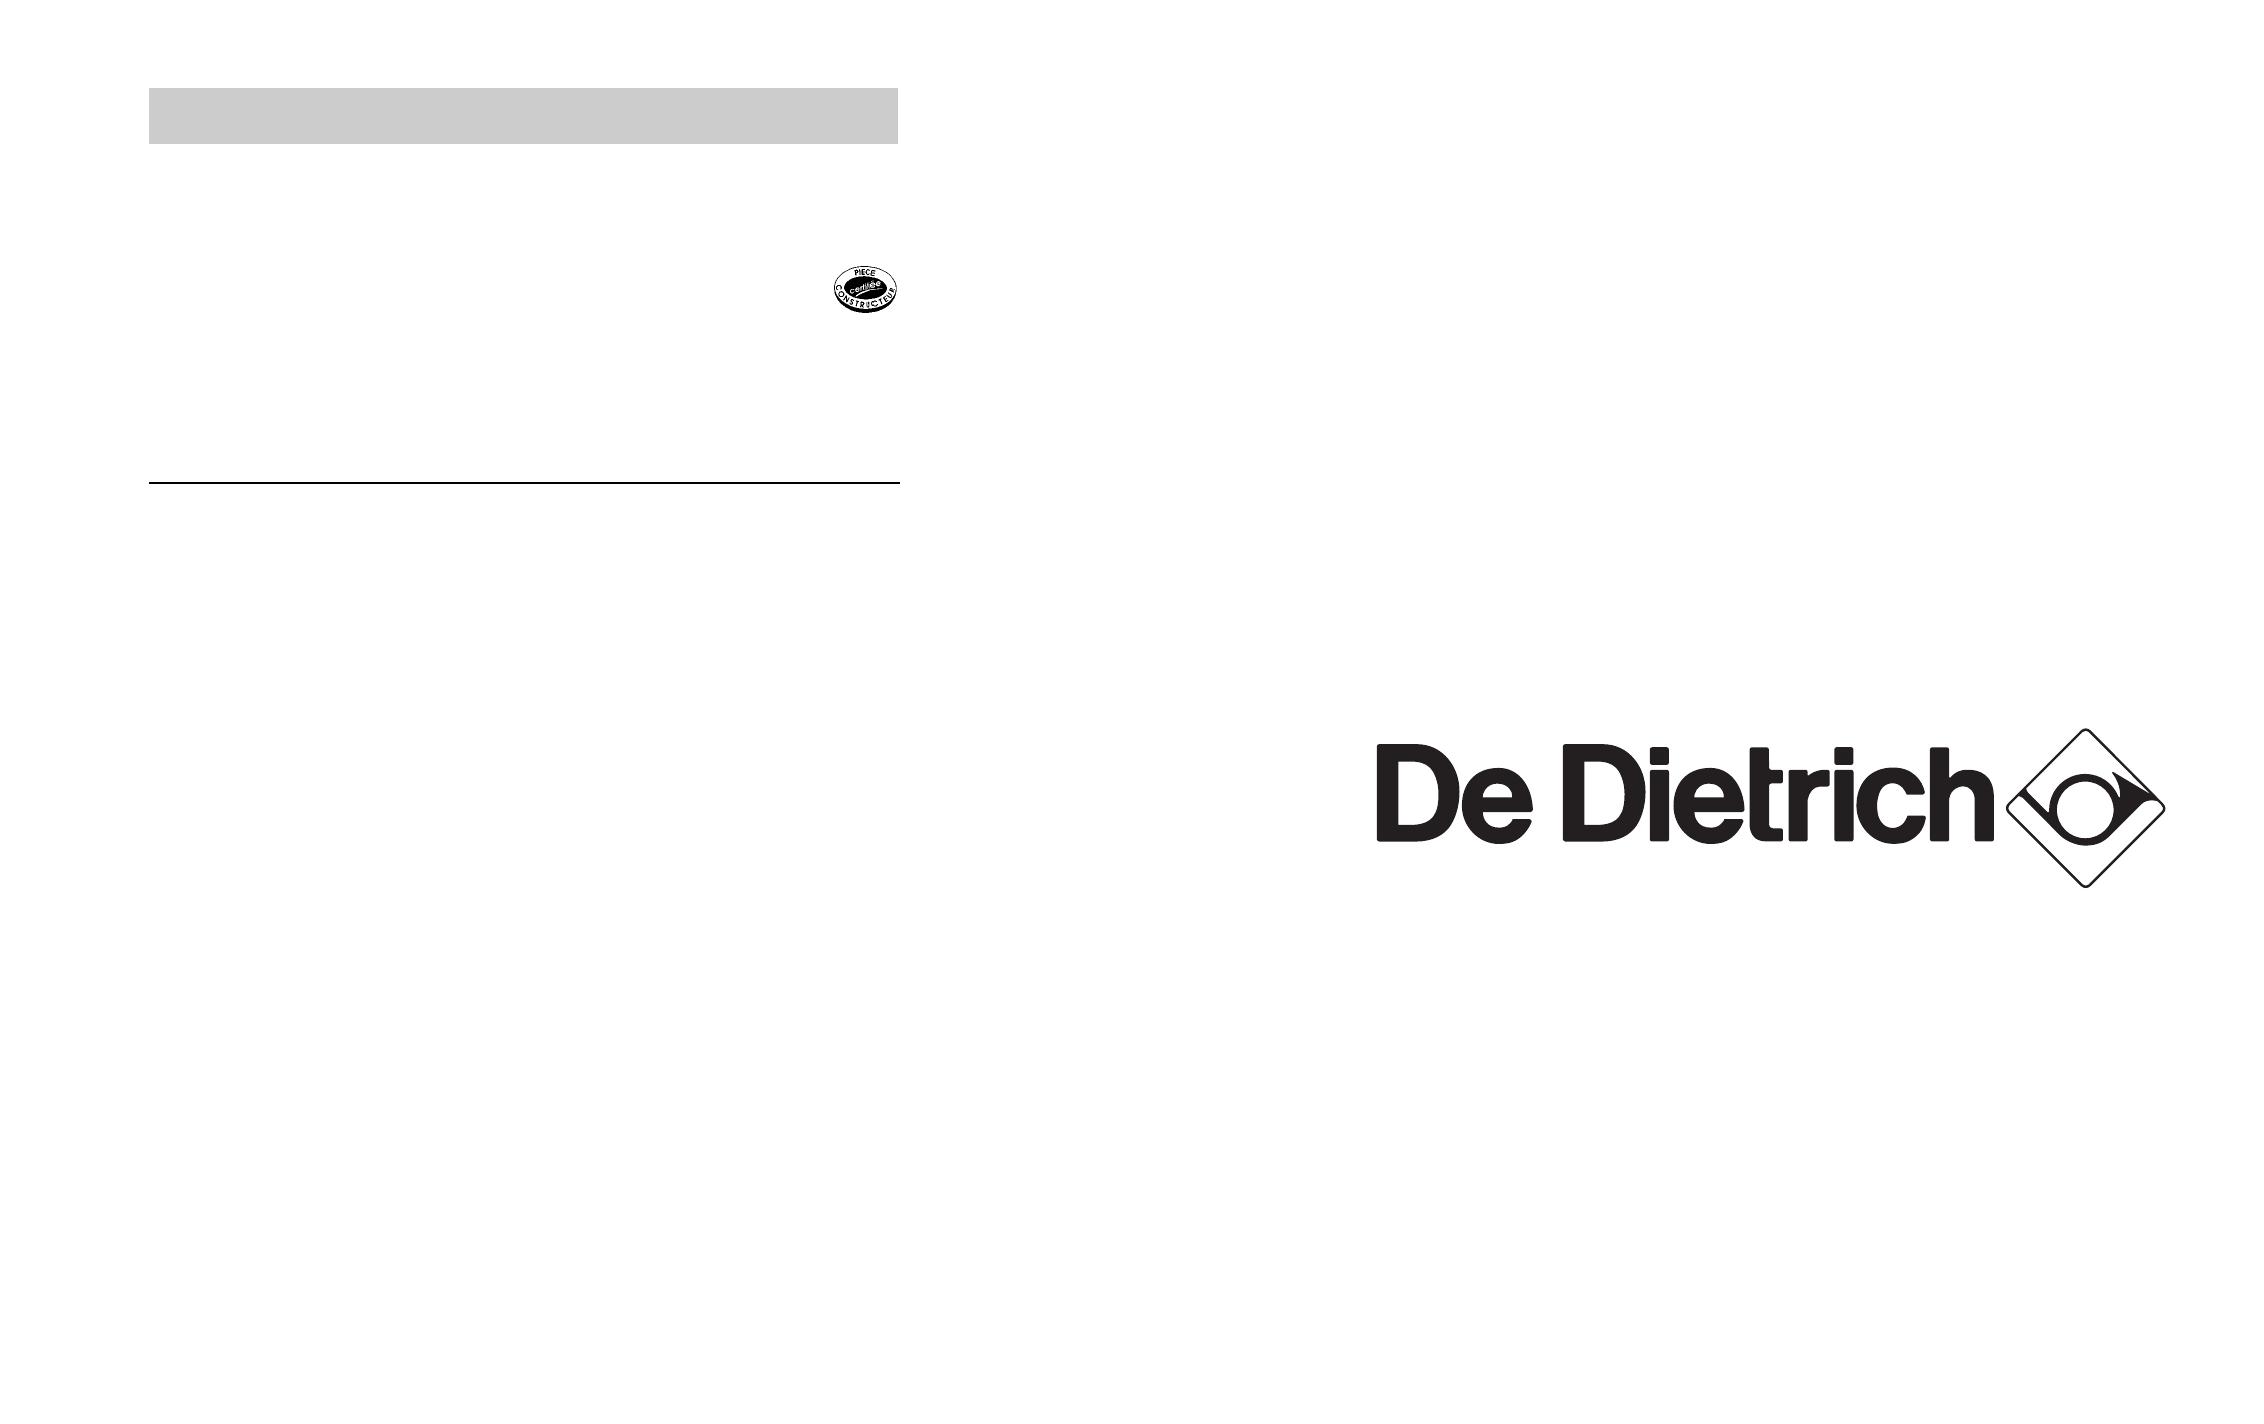 Handleiding De Dietrich Dcm 390 Xe1 Pagina 1 Van 6 English